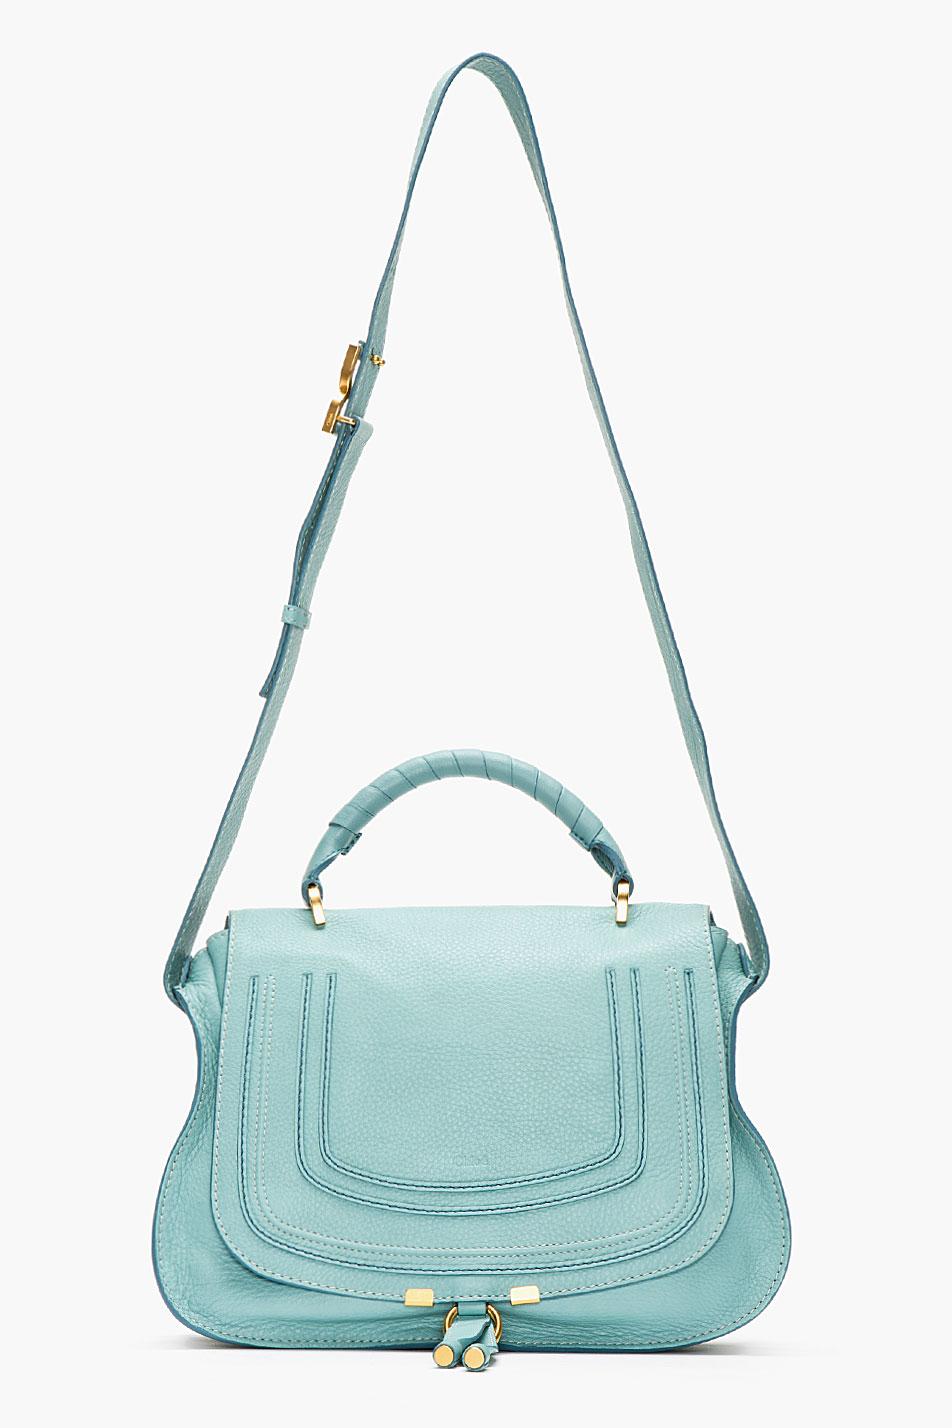 chloe green handbag marcie